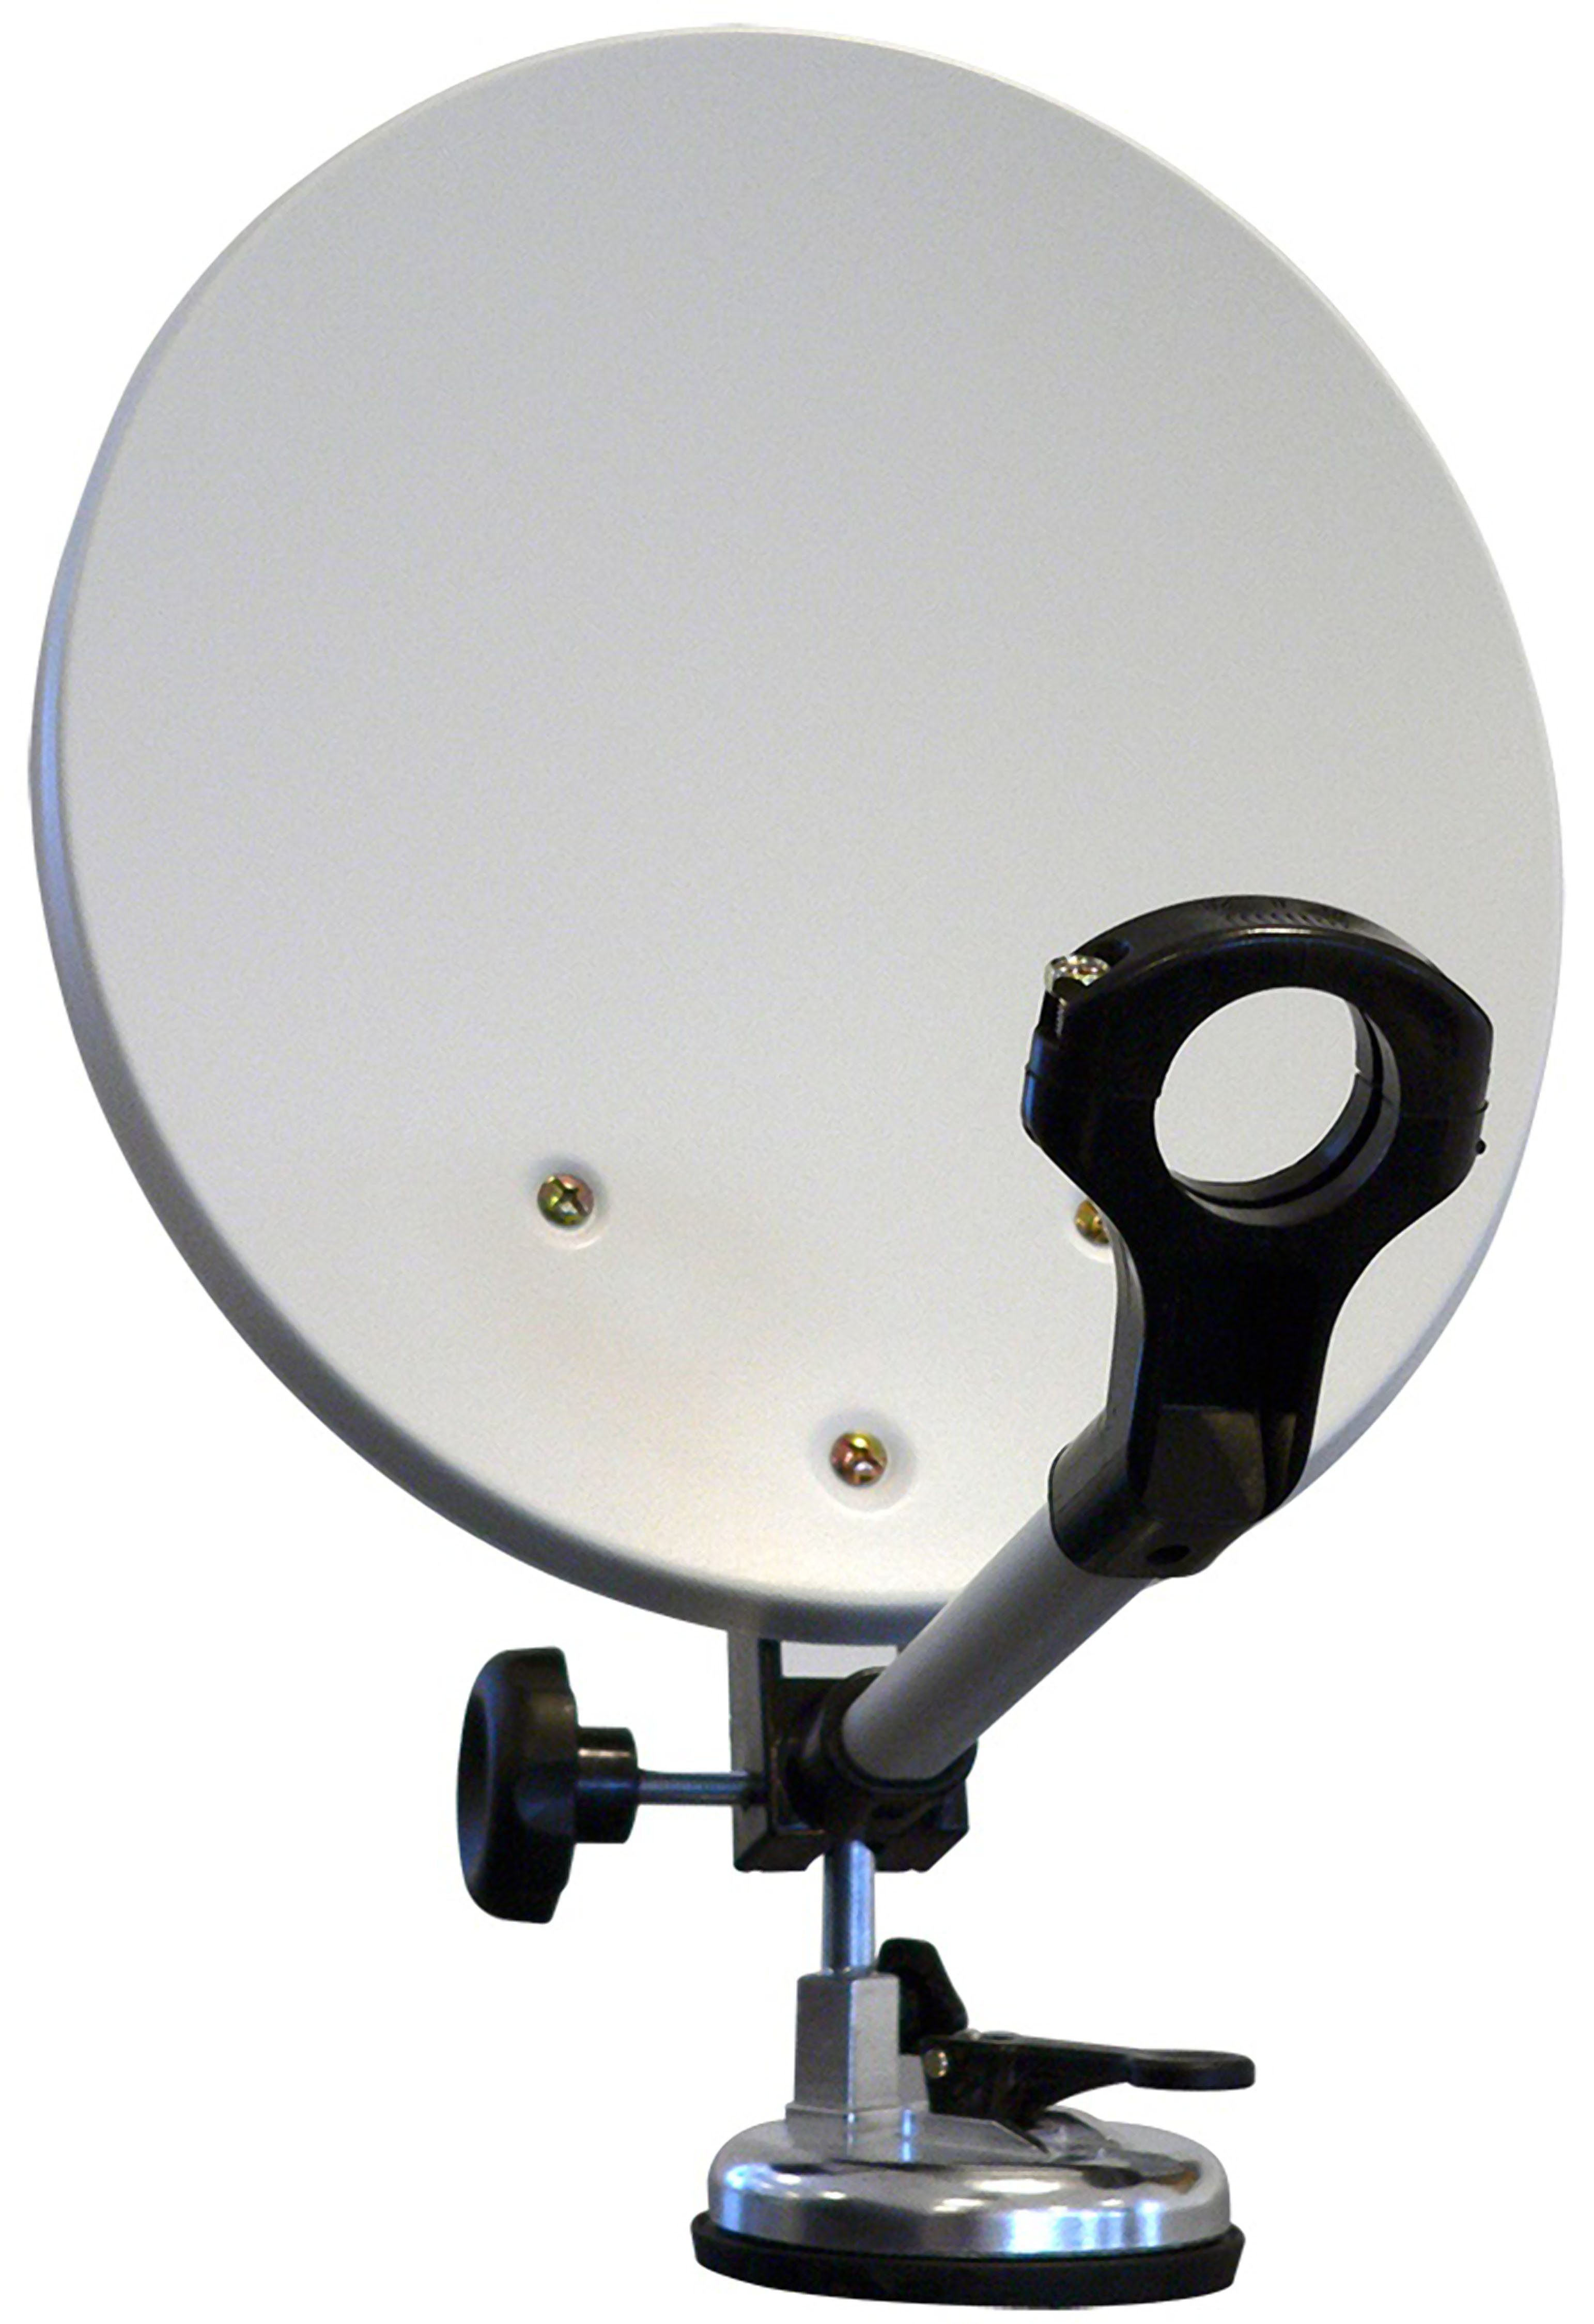 Maximum Tragbare, mobile Camping SAT-Anlage für DVB-S/S2 im Koffer »Camping Dish - 4232«